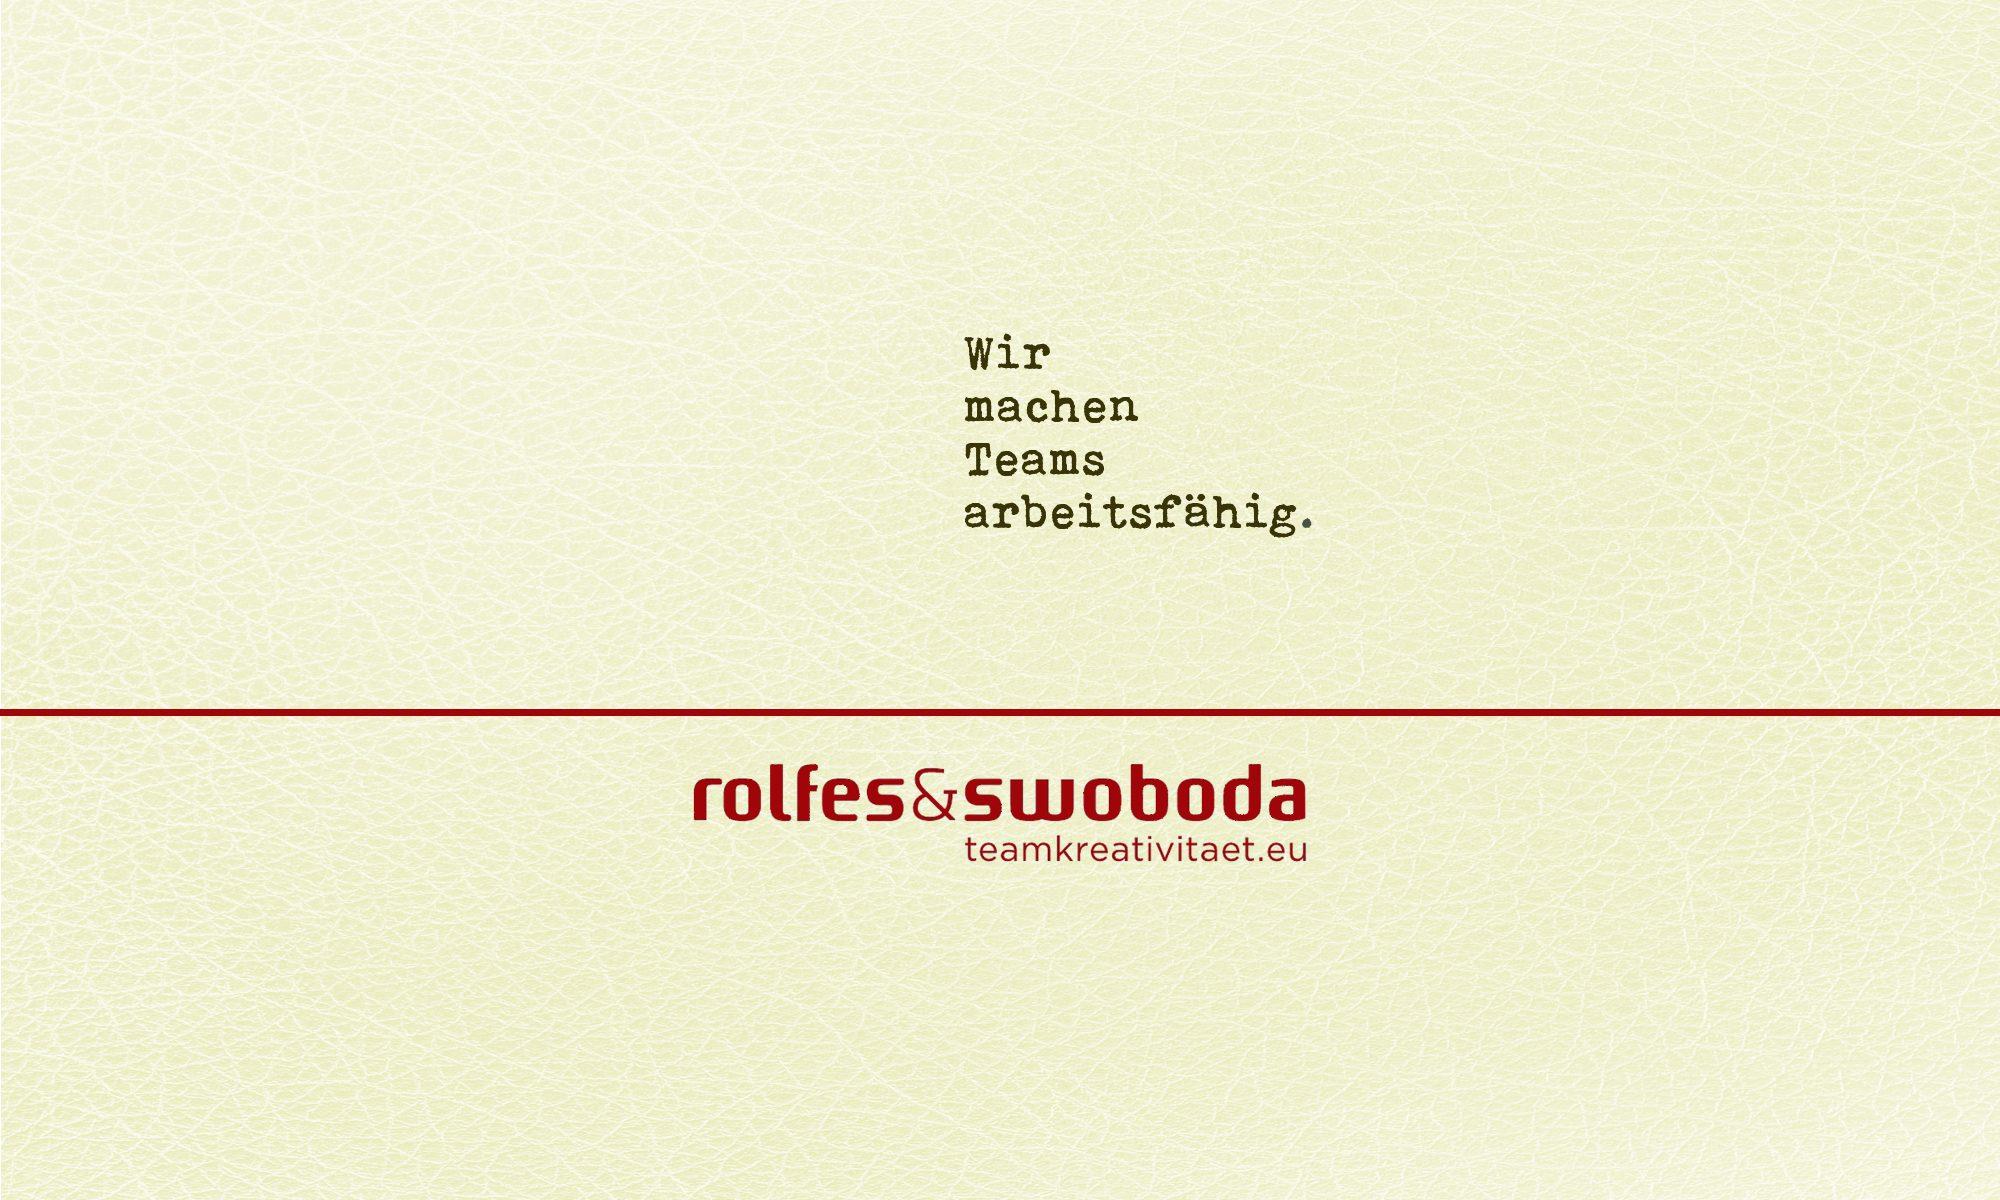 rolfes&swoboda